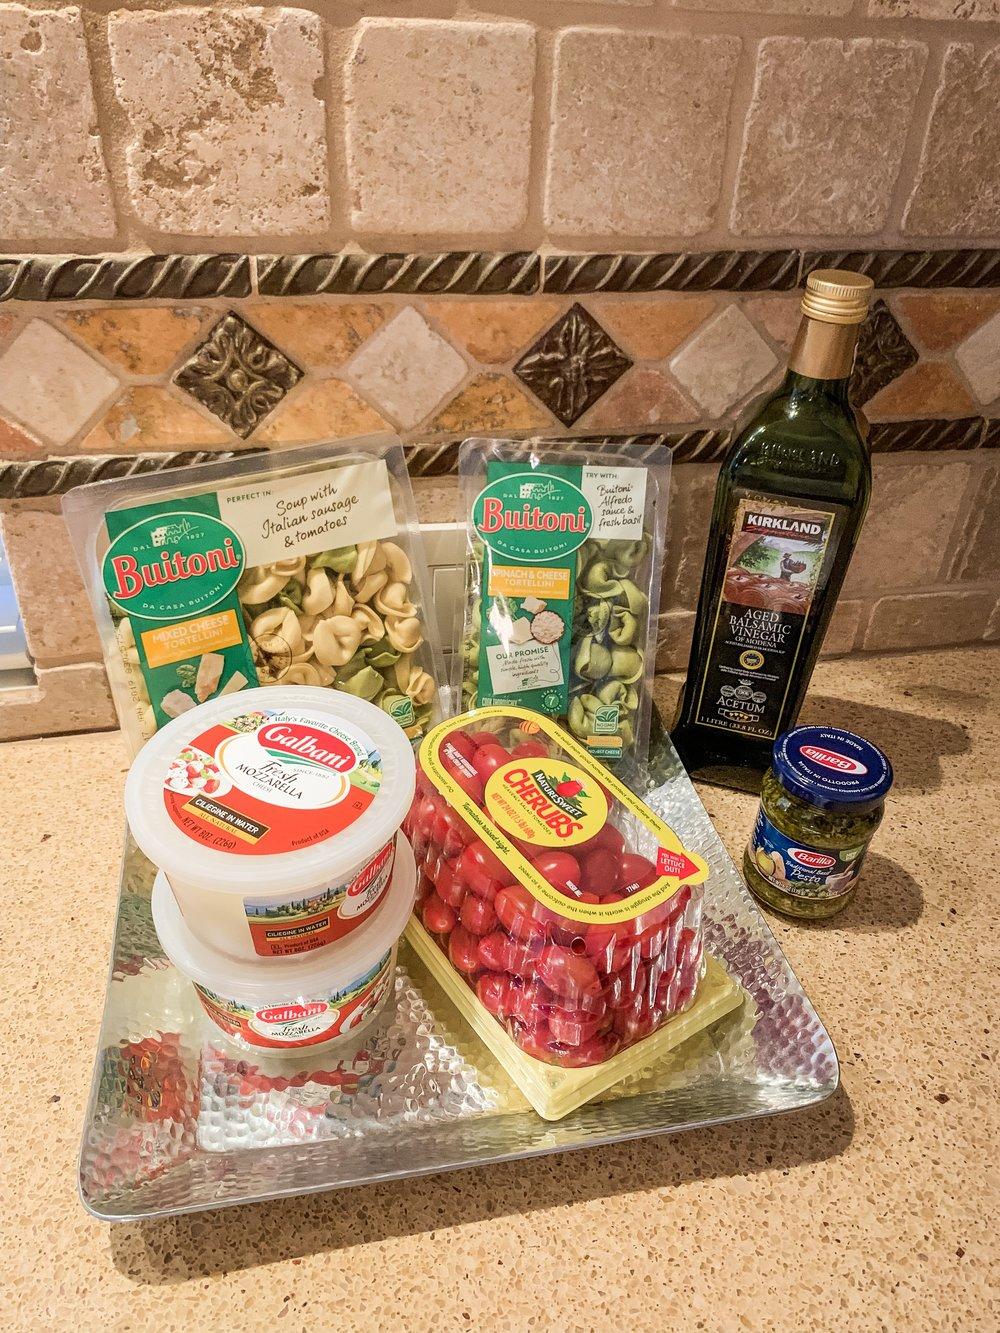 Ingredients - Plus olive oil, salt and pepper